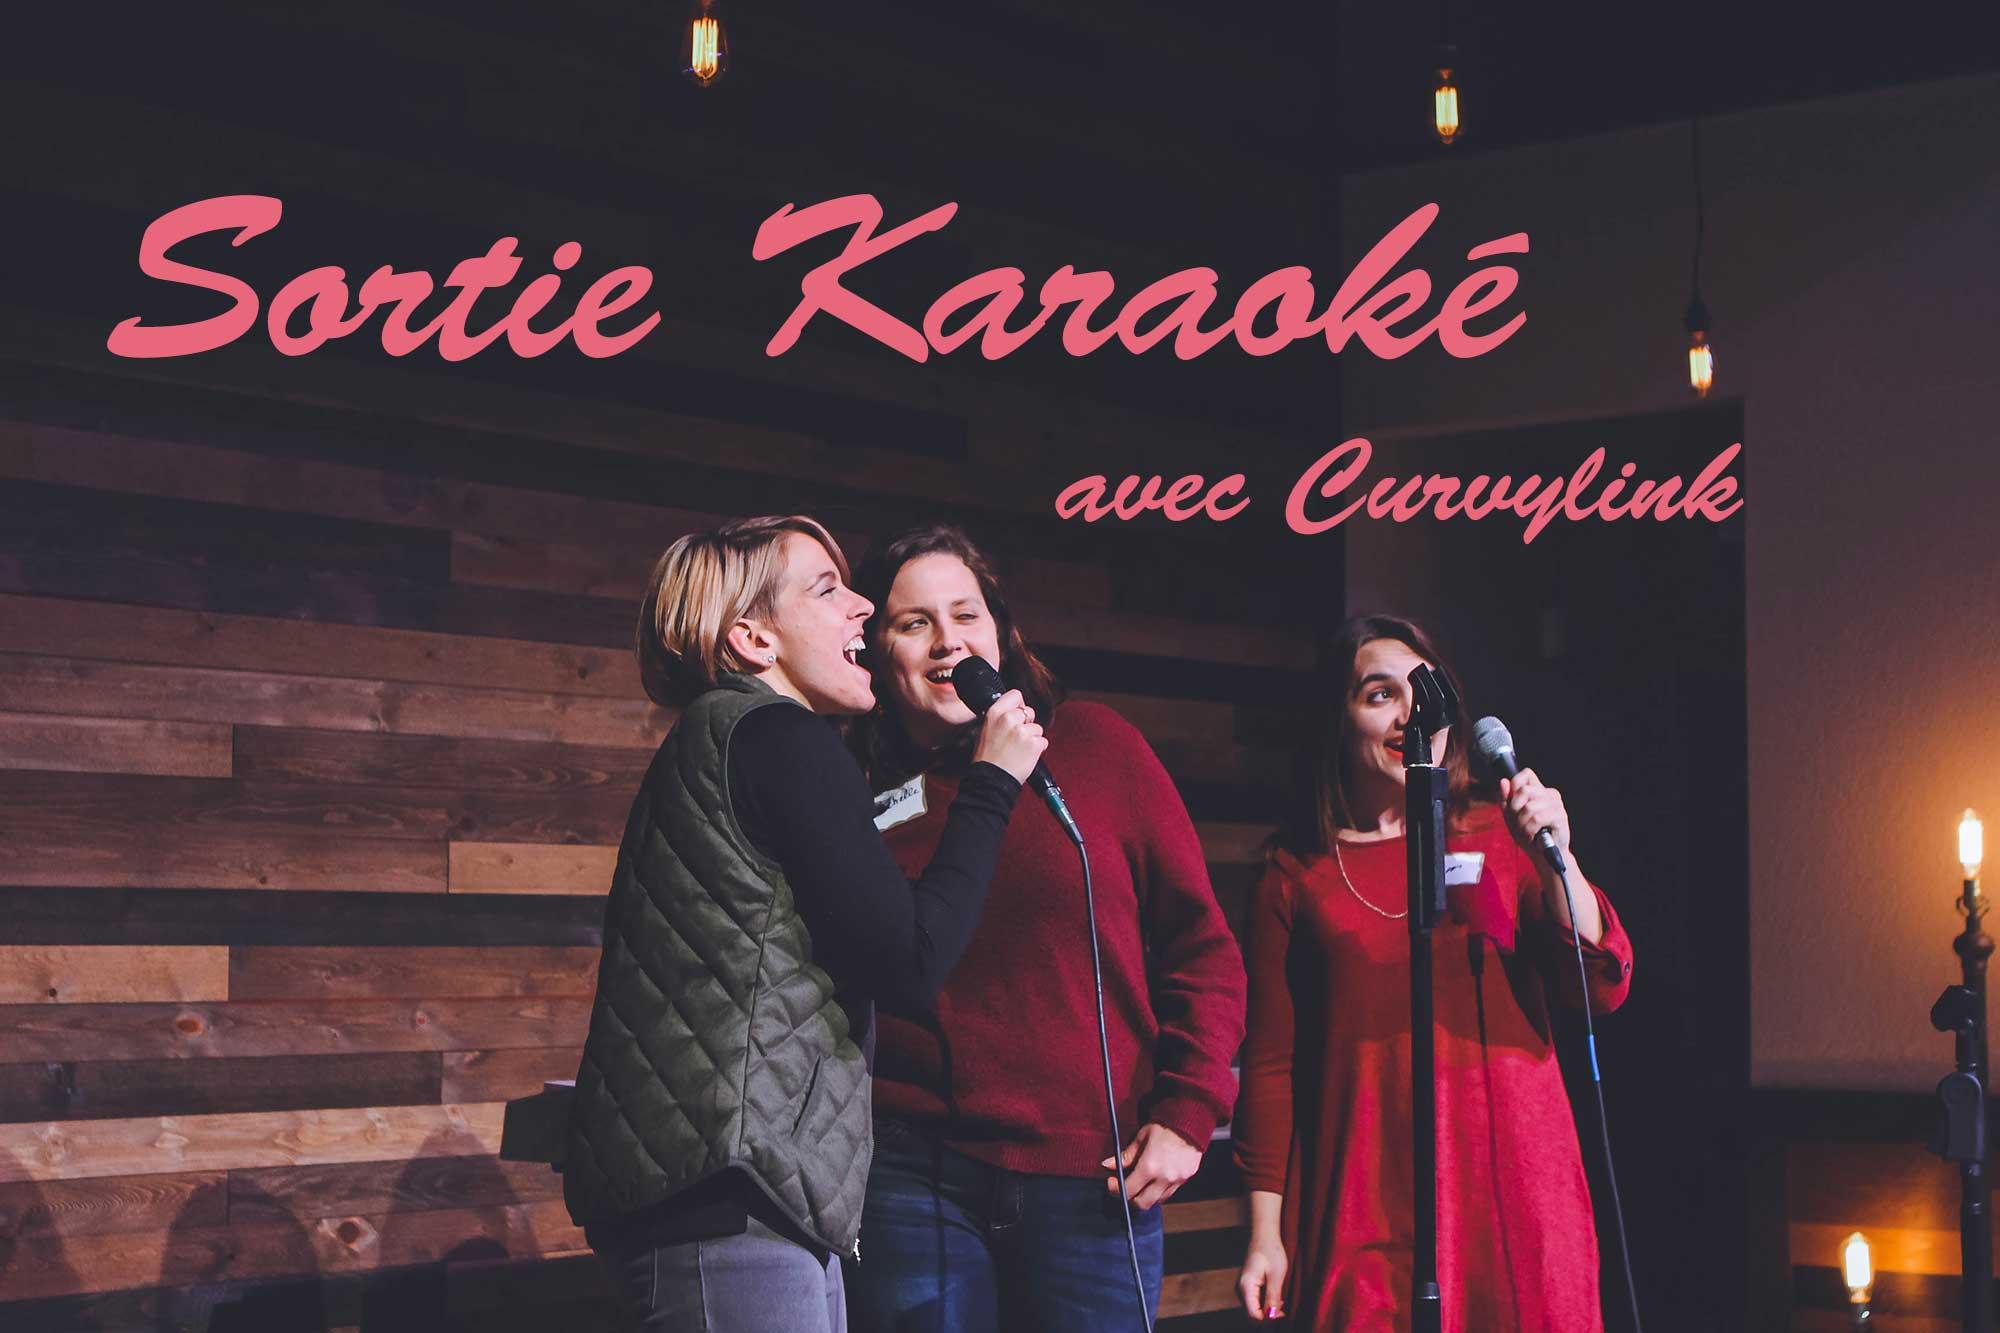 Sortie Karaoké Curvylink : Paris le 21 mars 2020